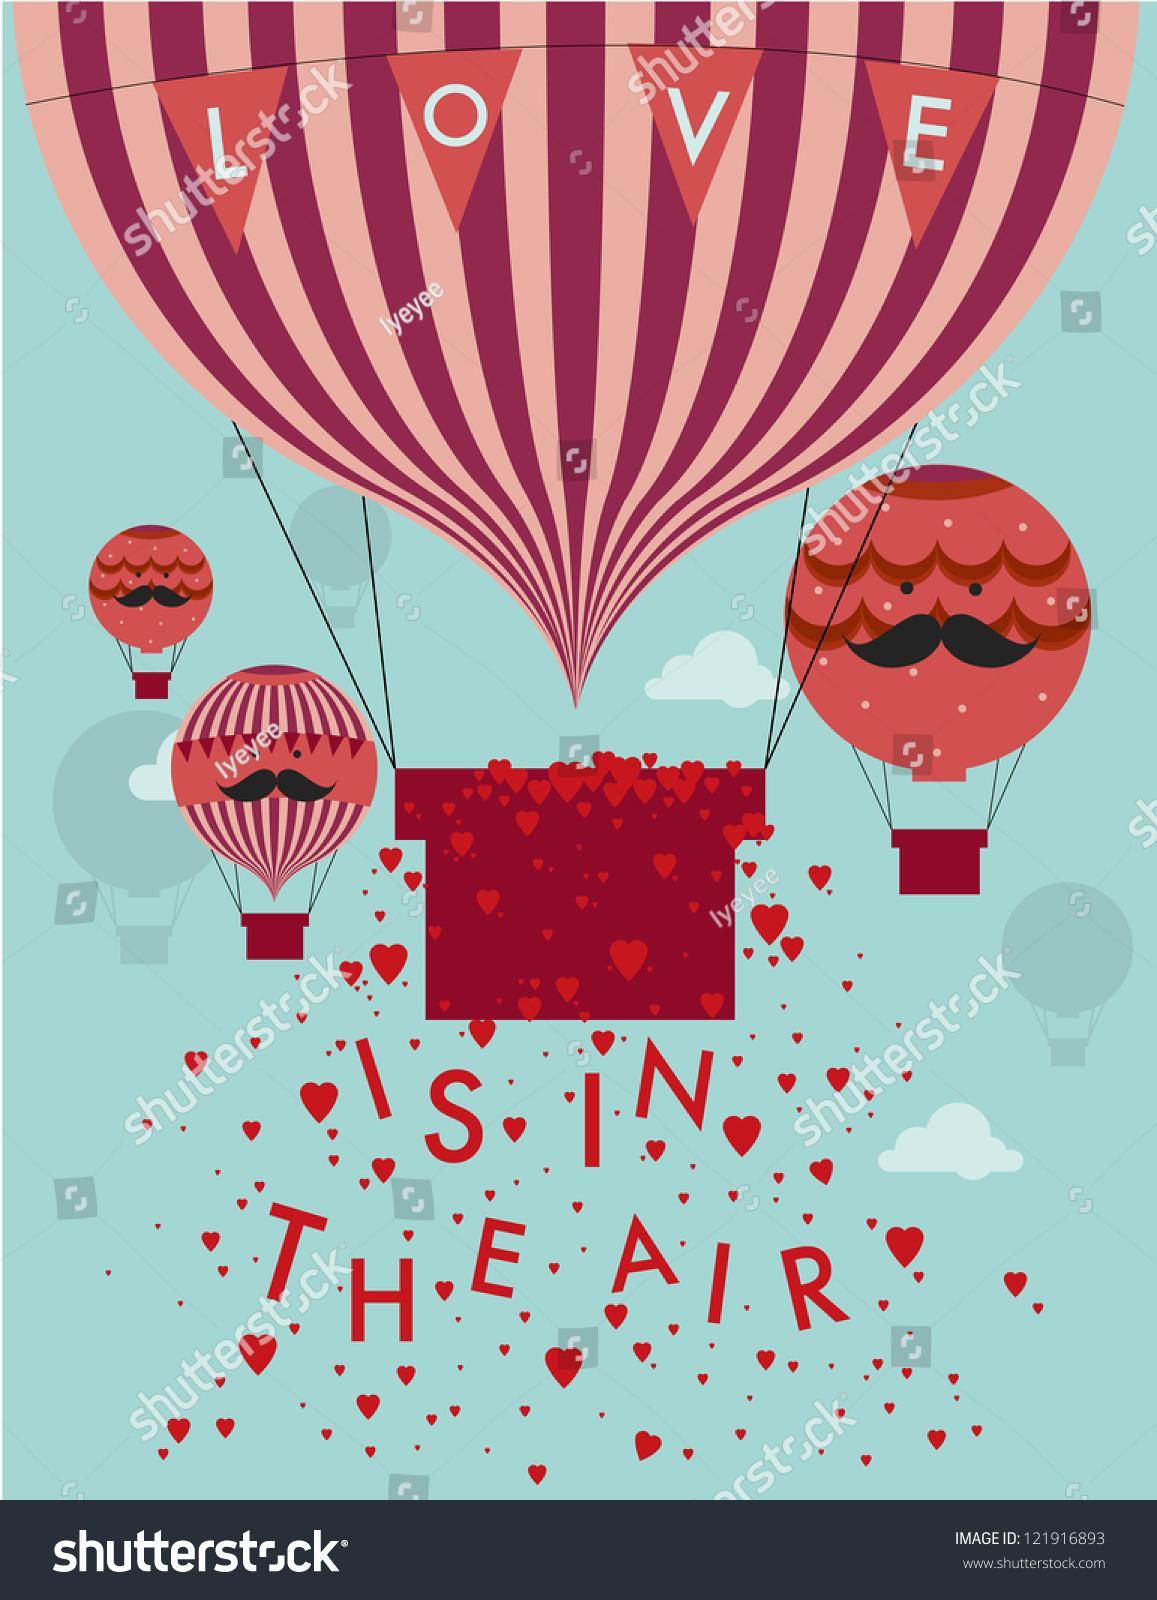 Love Air Hot Air Balloon Template Stok Vektör (Telifsiz) 121916893 ...